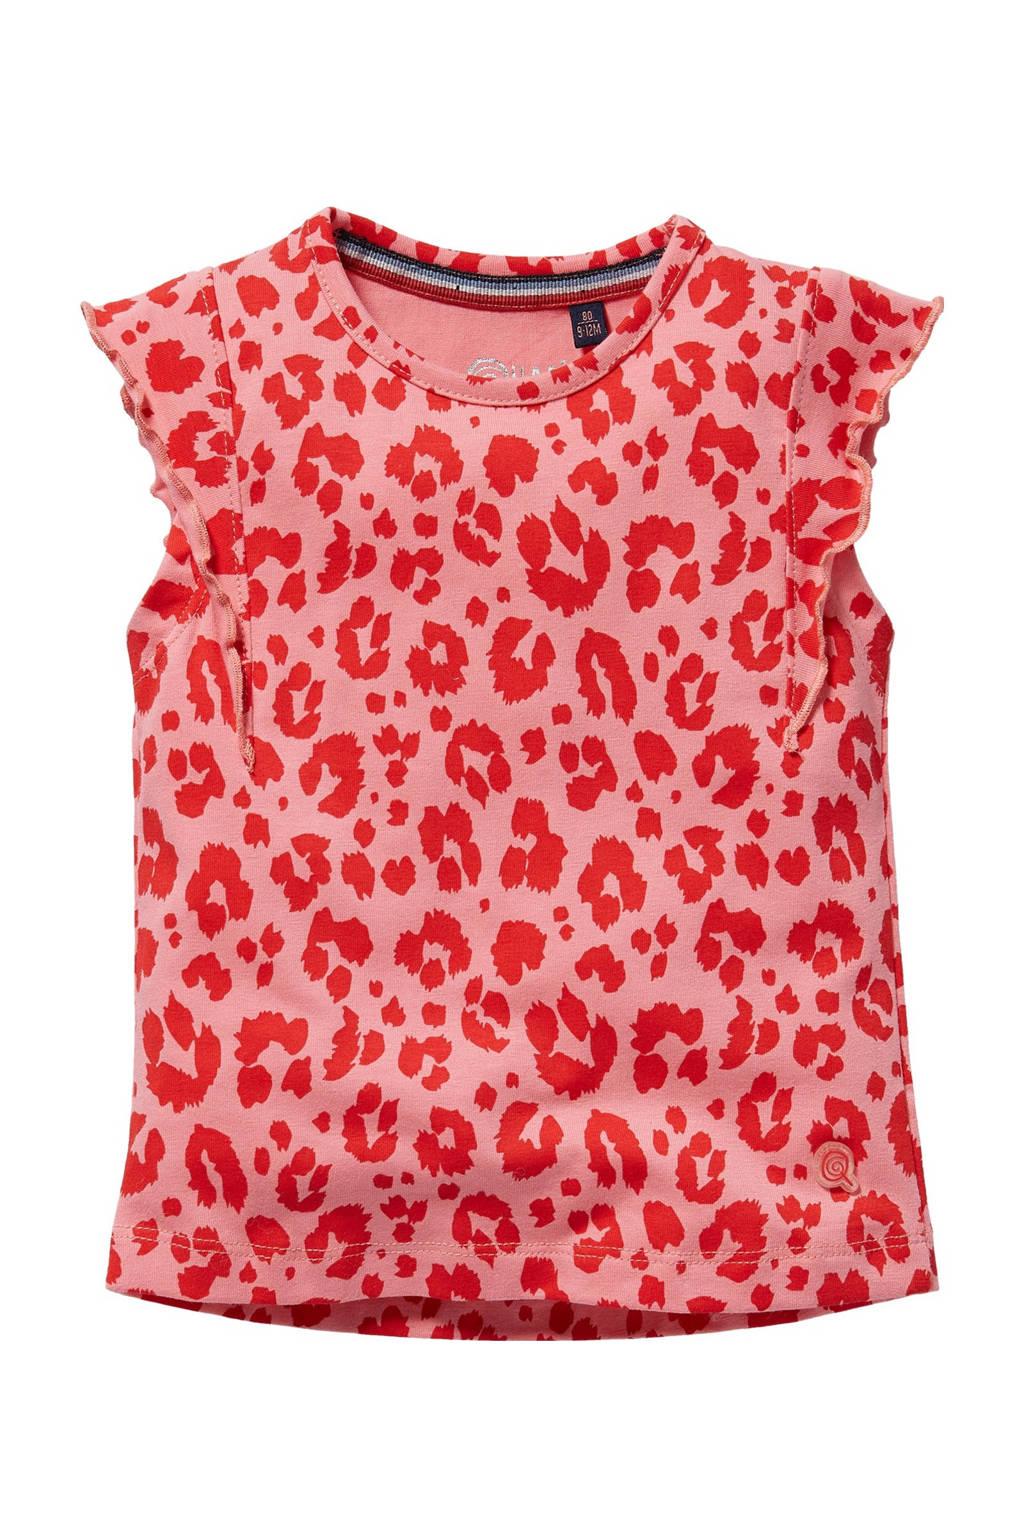 Quapi Mini T-shirt Gerdy met panterprint en ruches roze/rood, Roze/rood